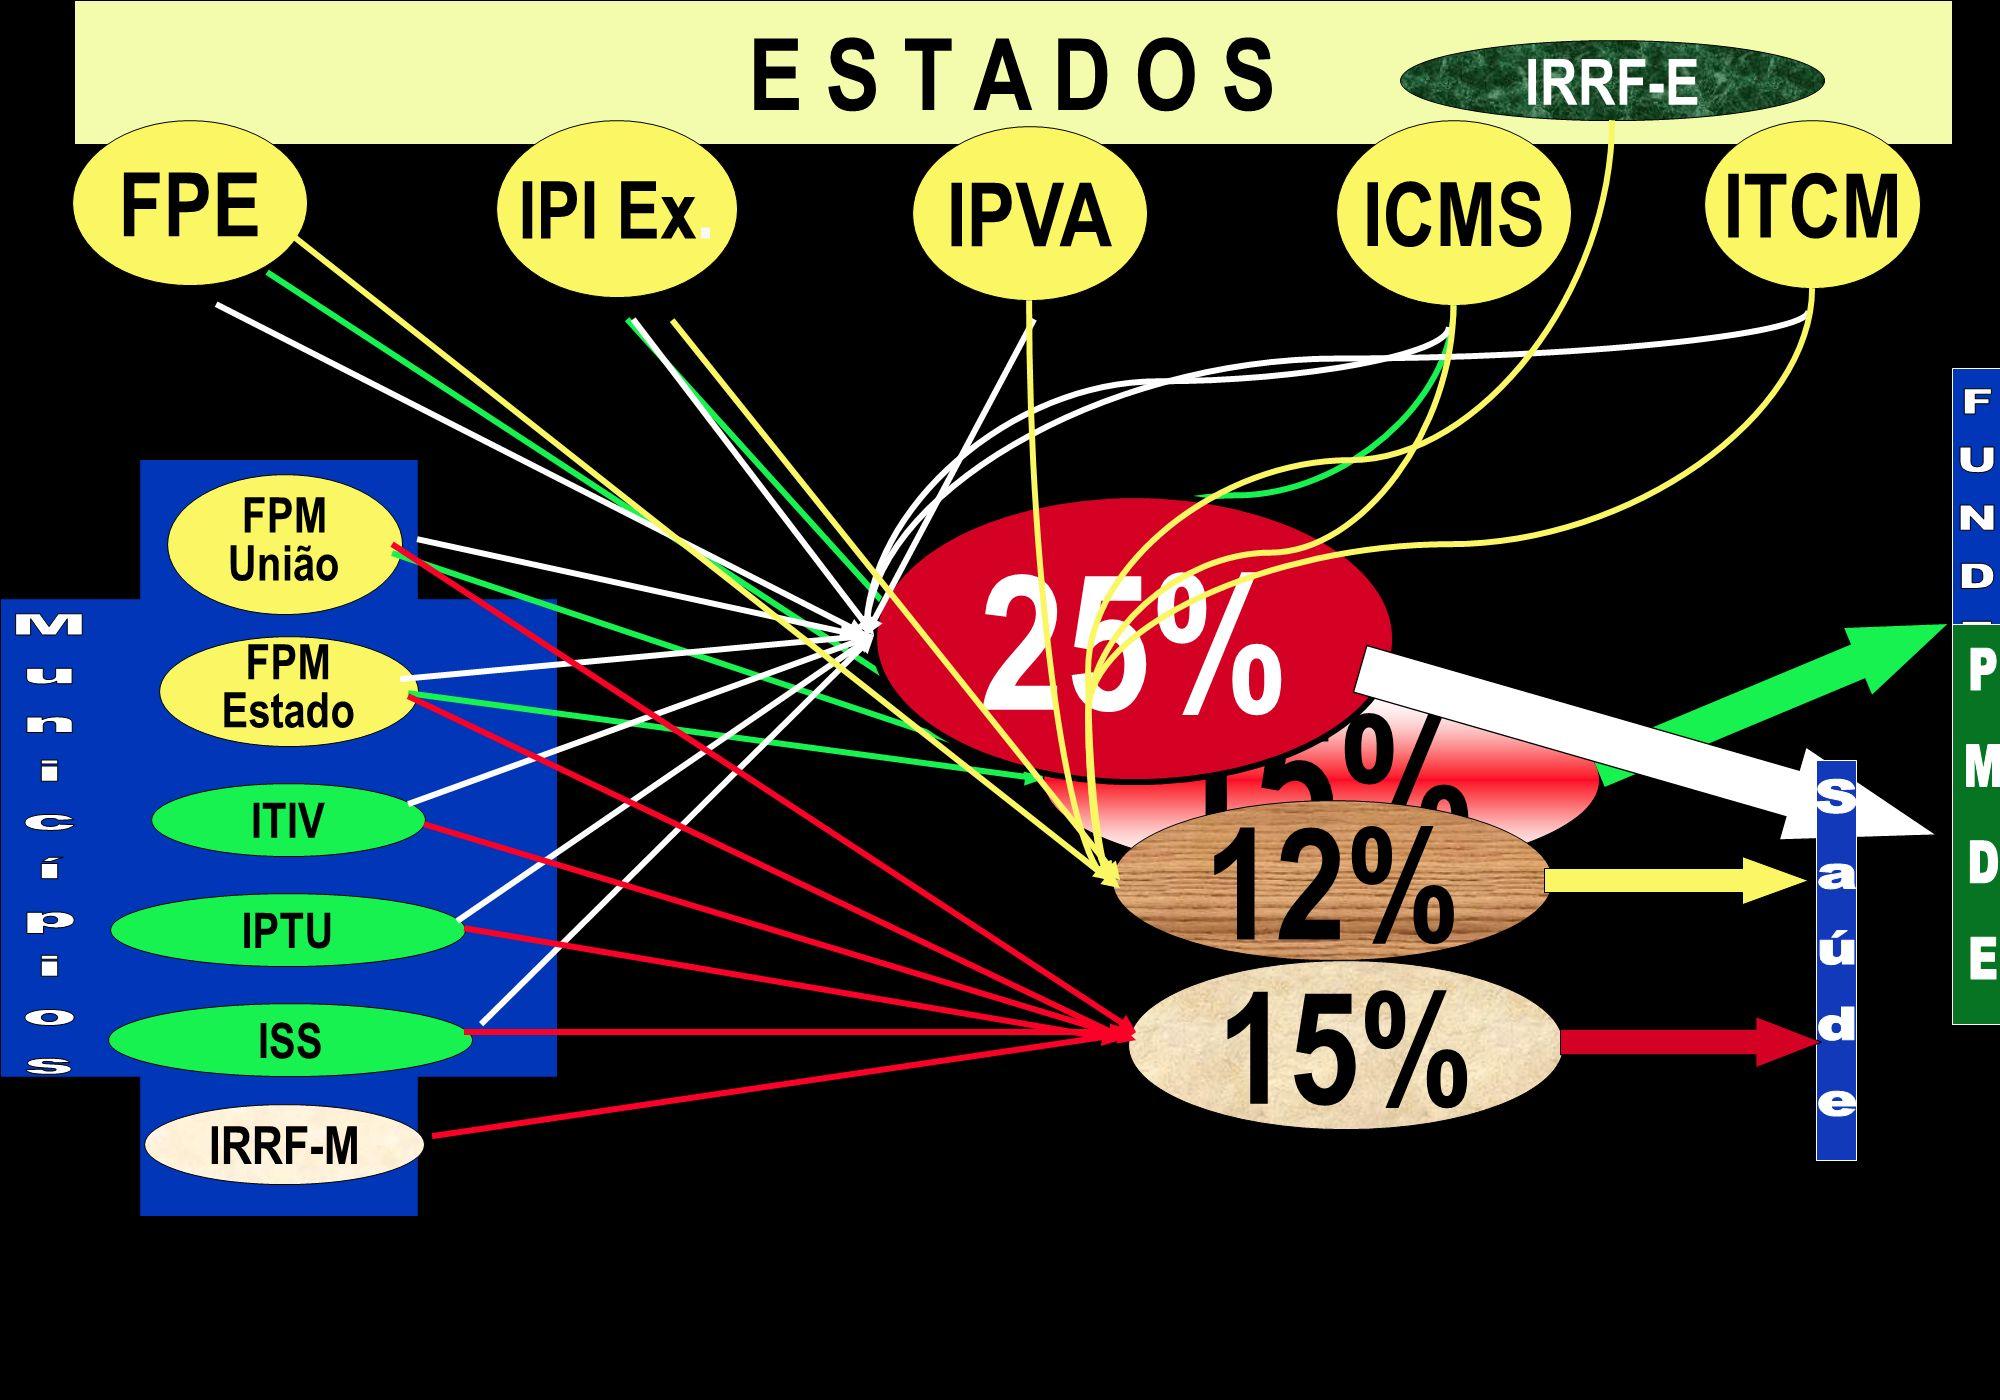 25% 15% 12% 15% E S T A D O S FPE ITCM IPVA ICMS IPI Ex. IRRF-E IRRF-M